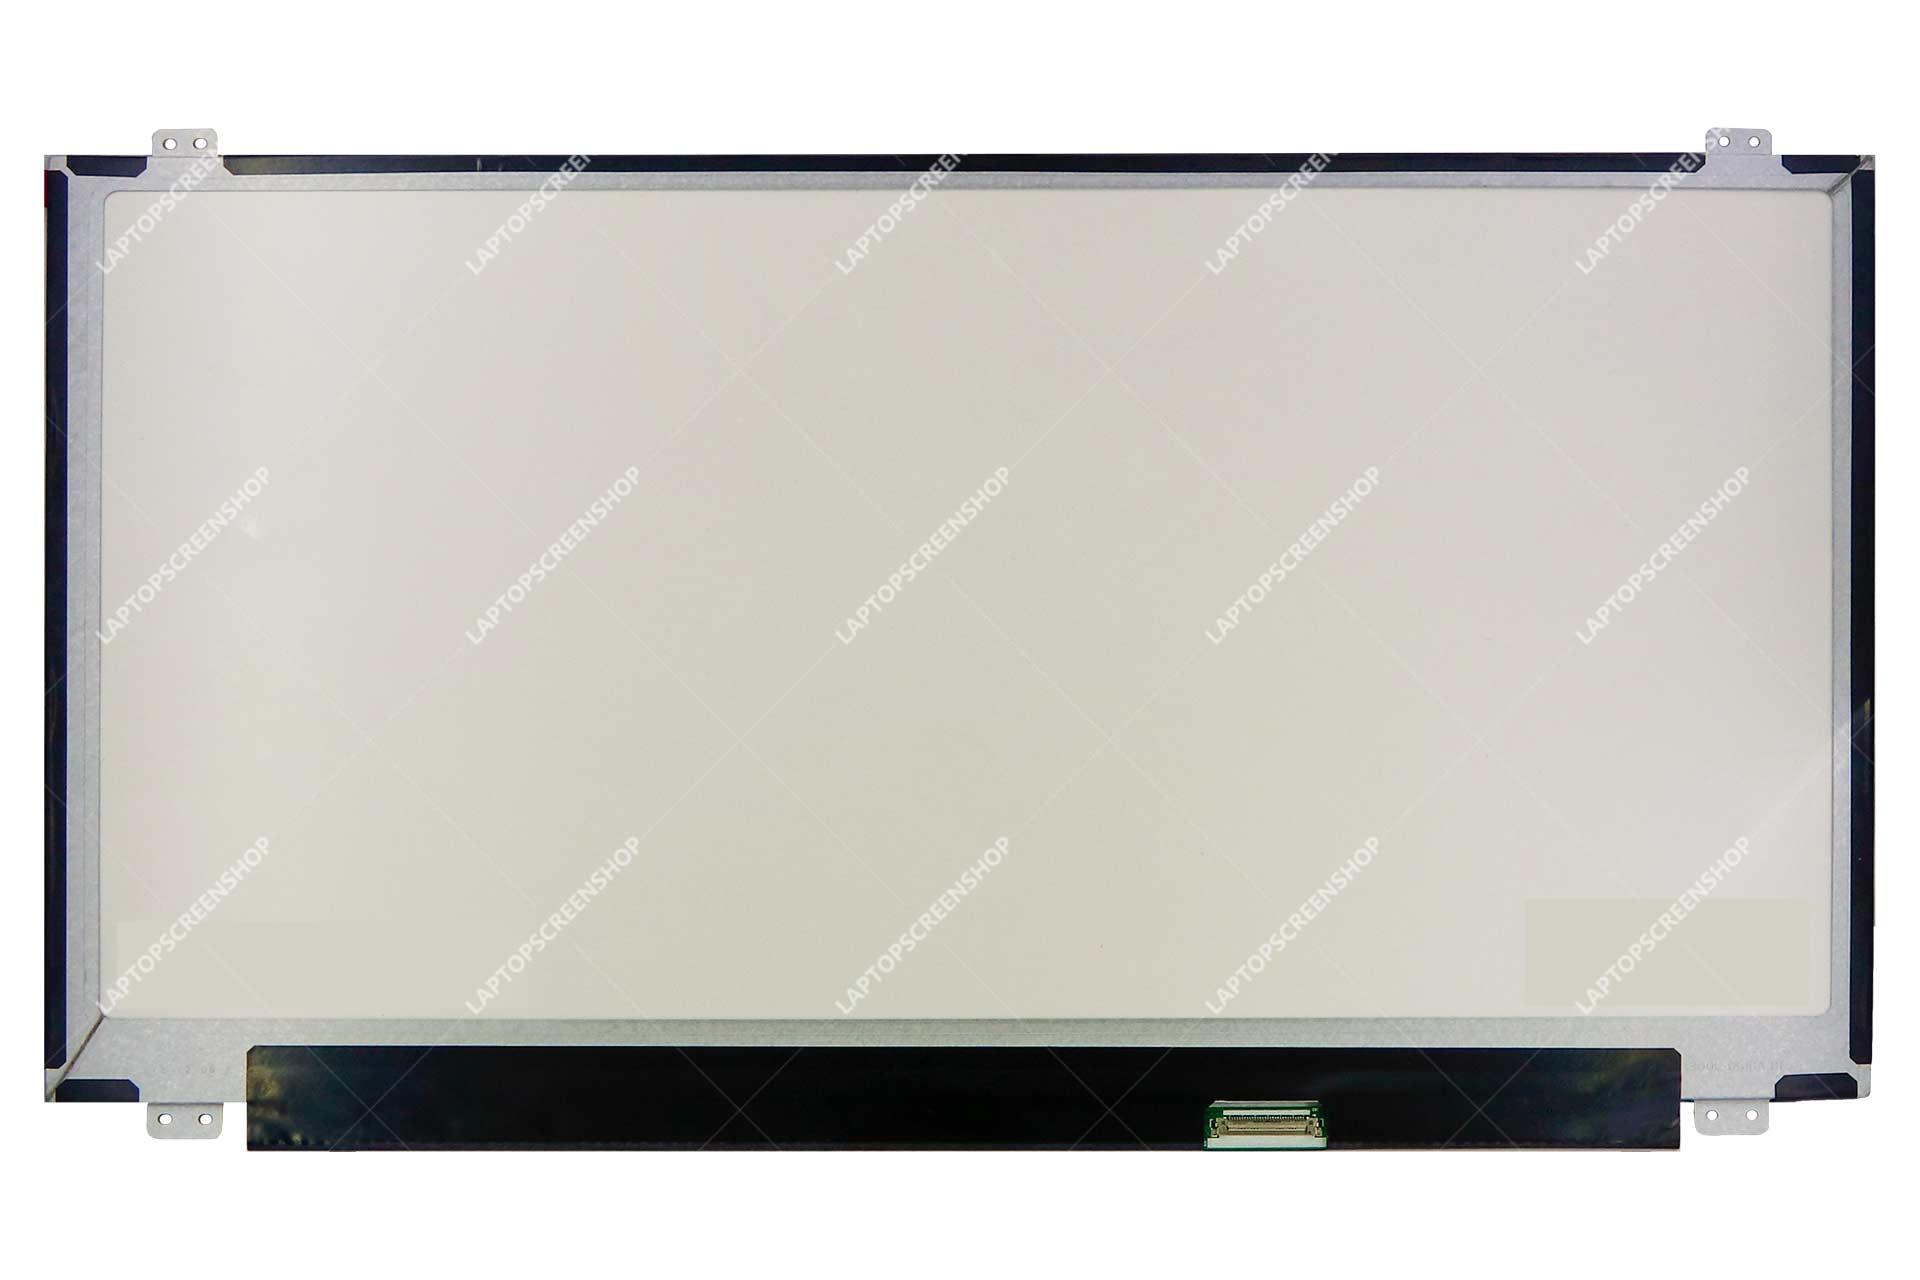 ACER-ASPIRE-E1-530-4416-LCD  HD فروشگاه لپ تاپ اسکرين   تعمير لپ تاپ